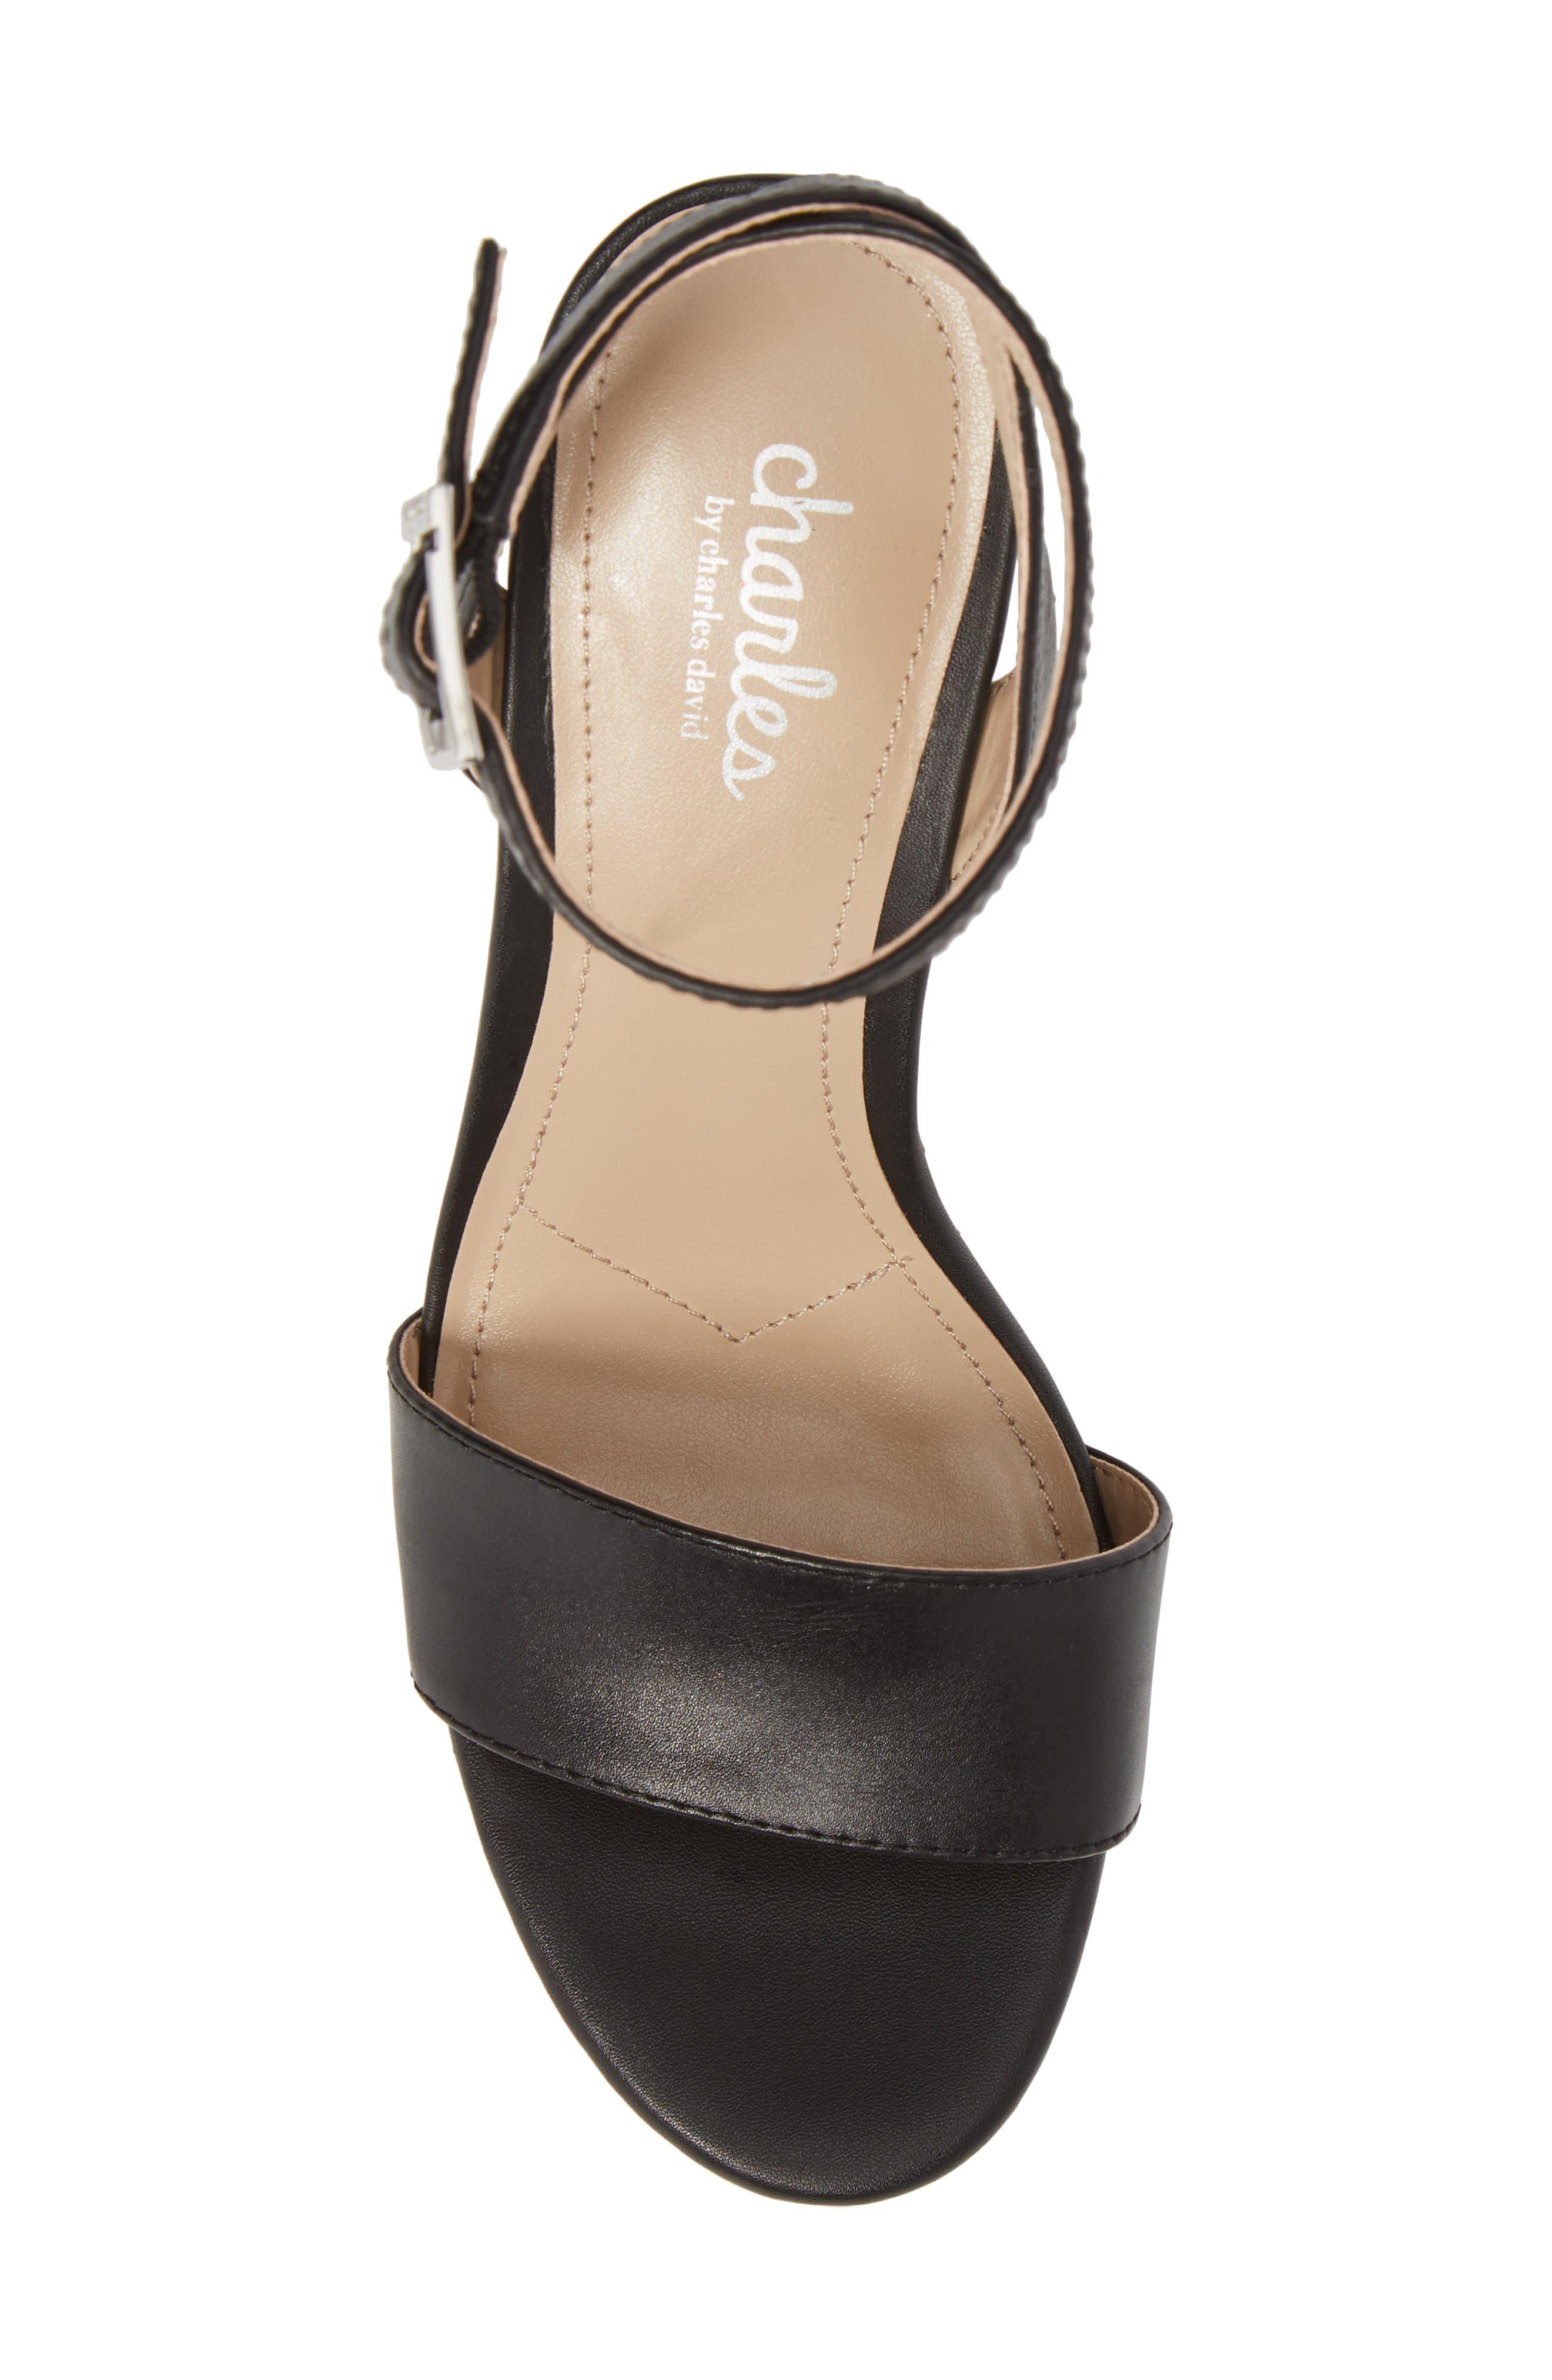 Lilla Platform Wedge Sandal,                             Alternate thumbnail 5, color,                             001